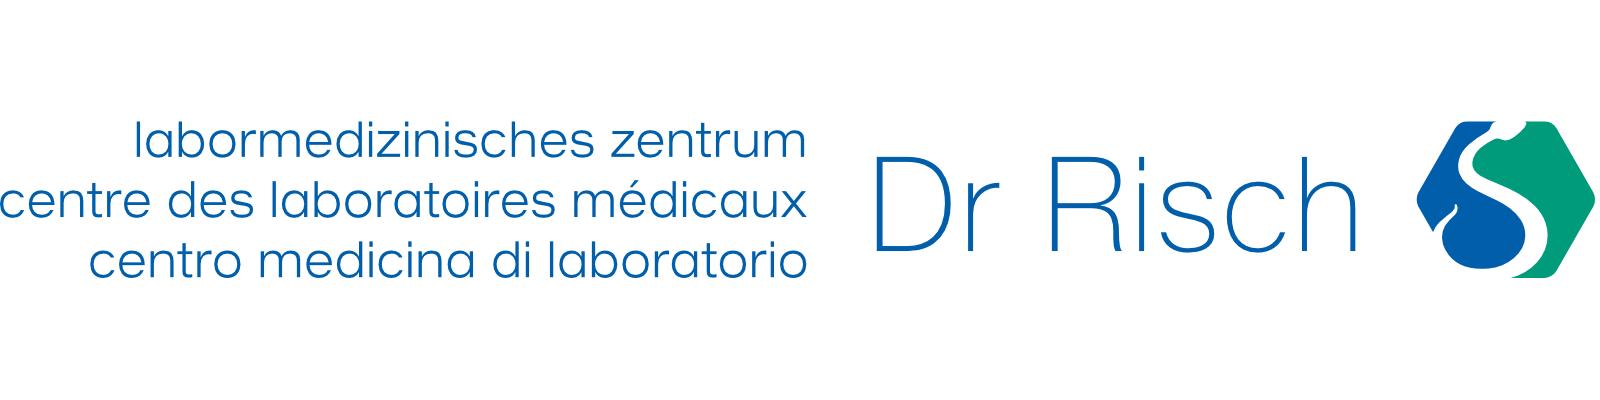 Dr Risch logo